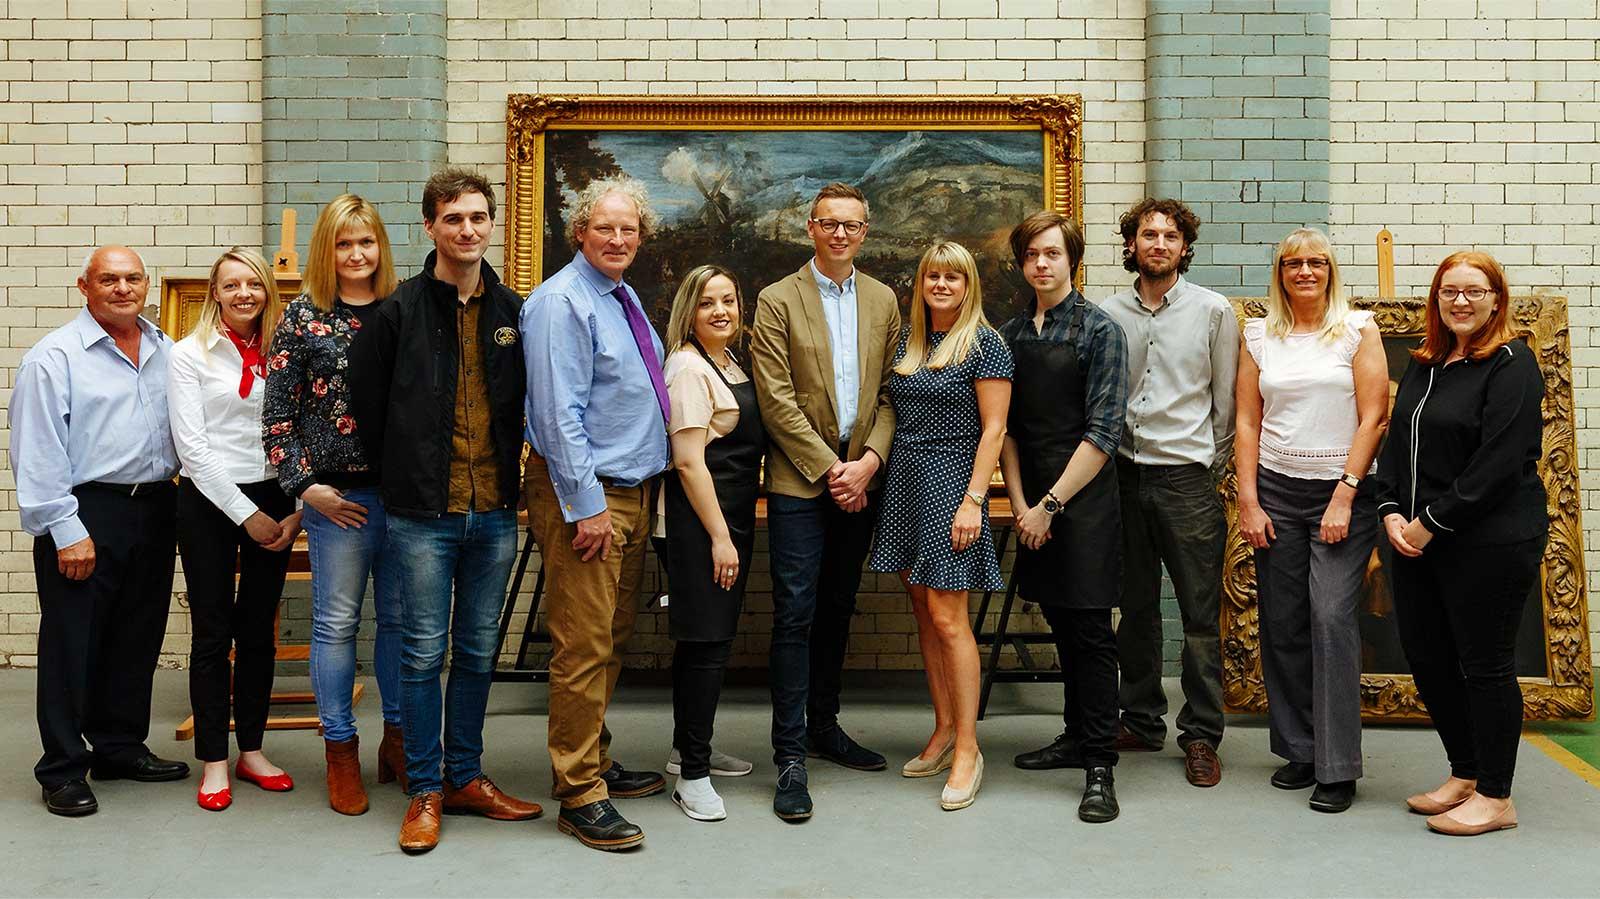 The Fine Art Restoration Company team